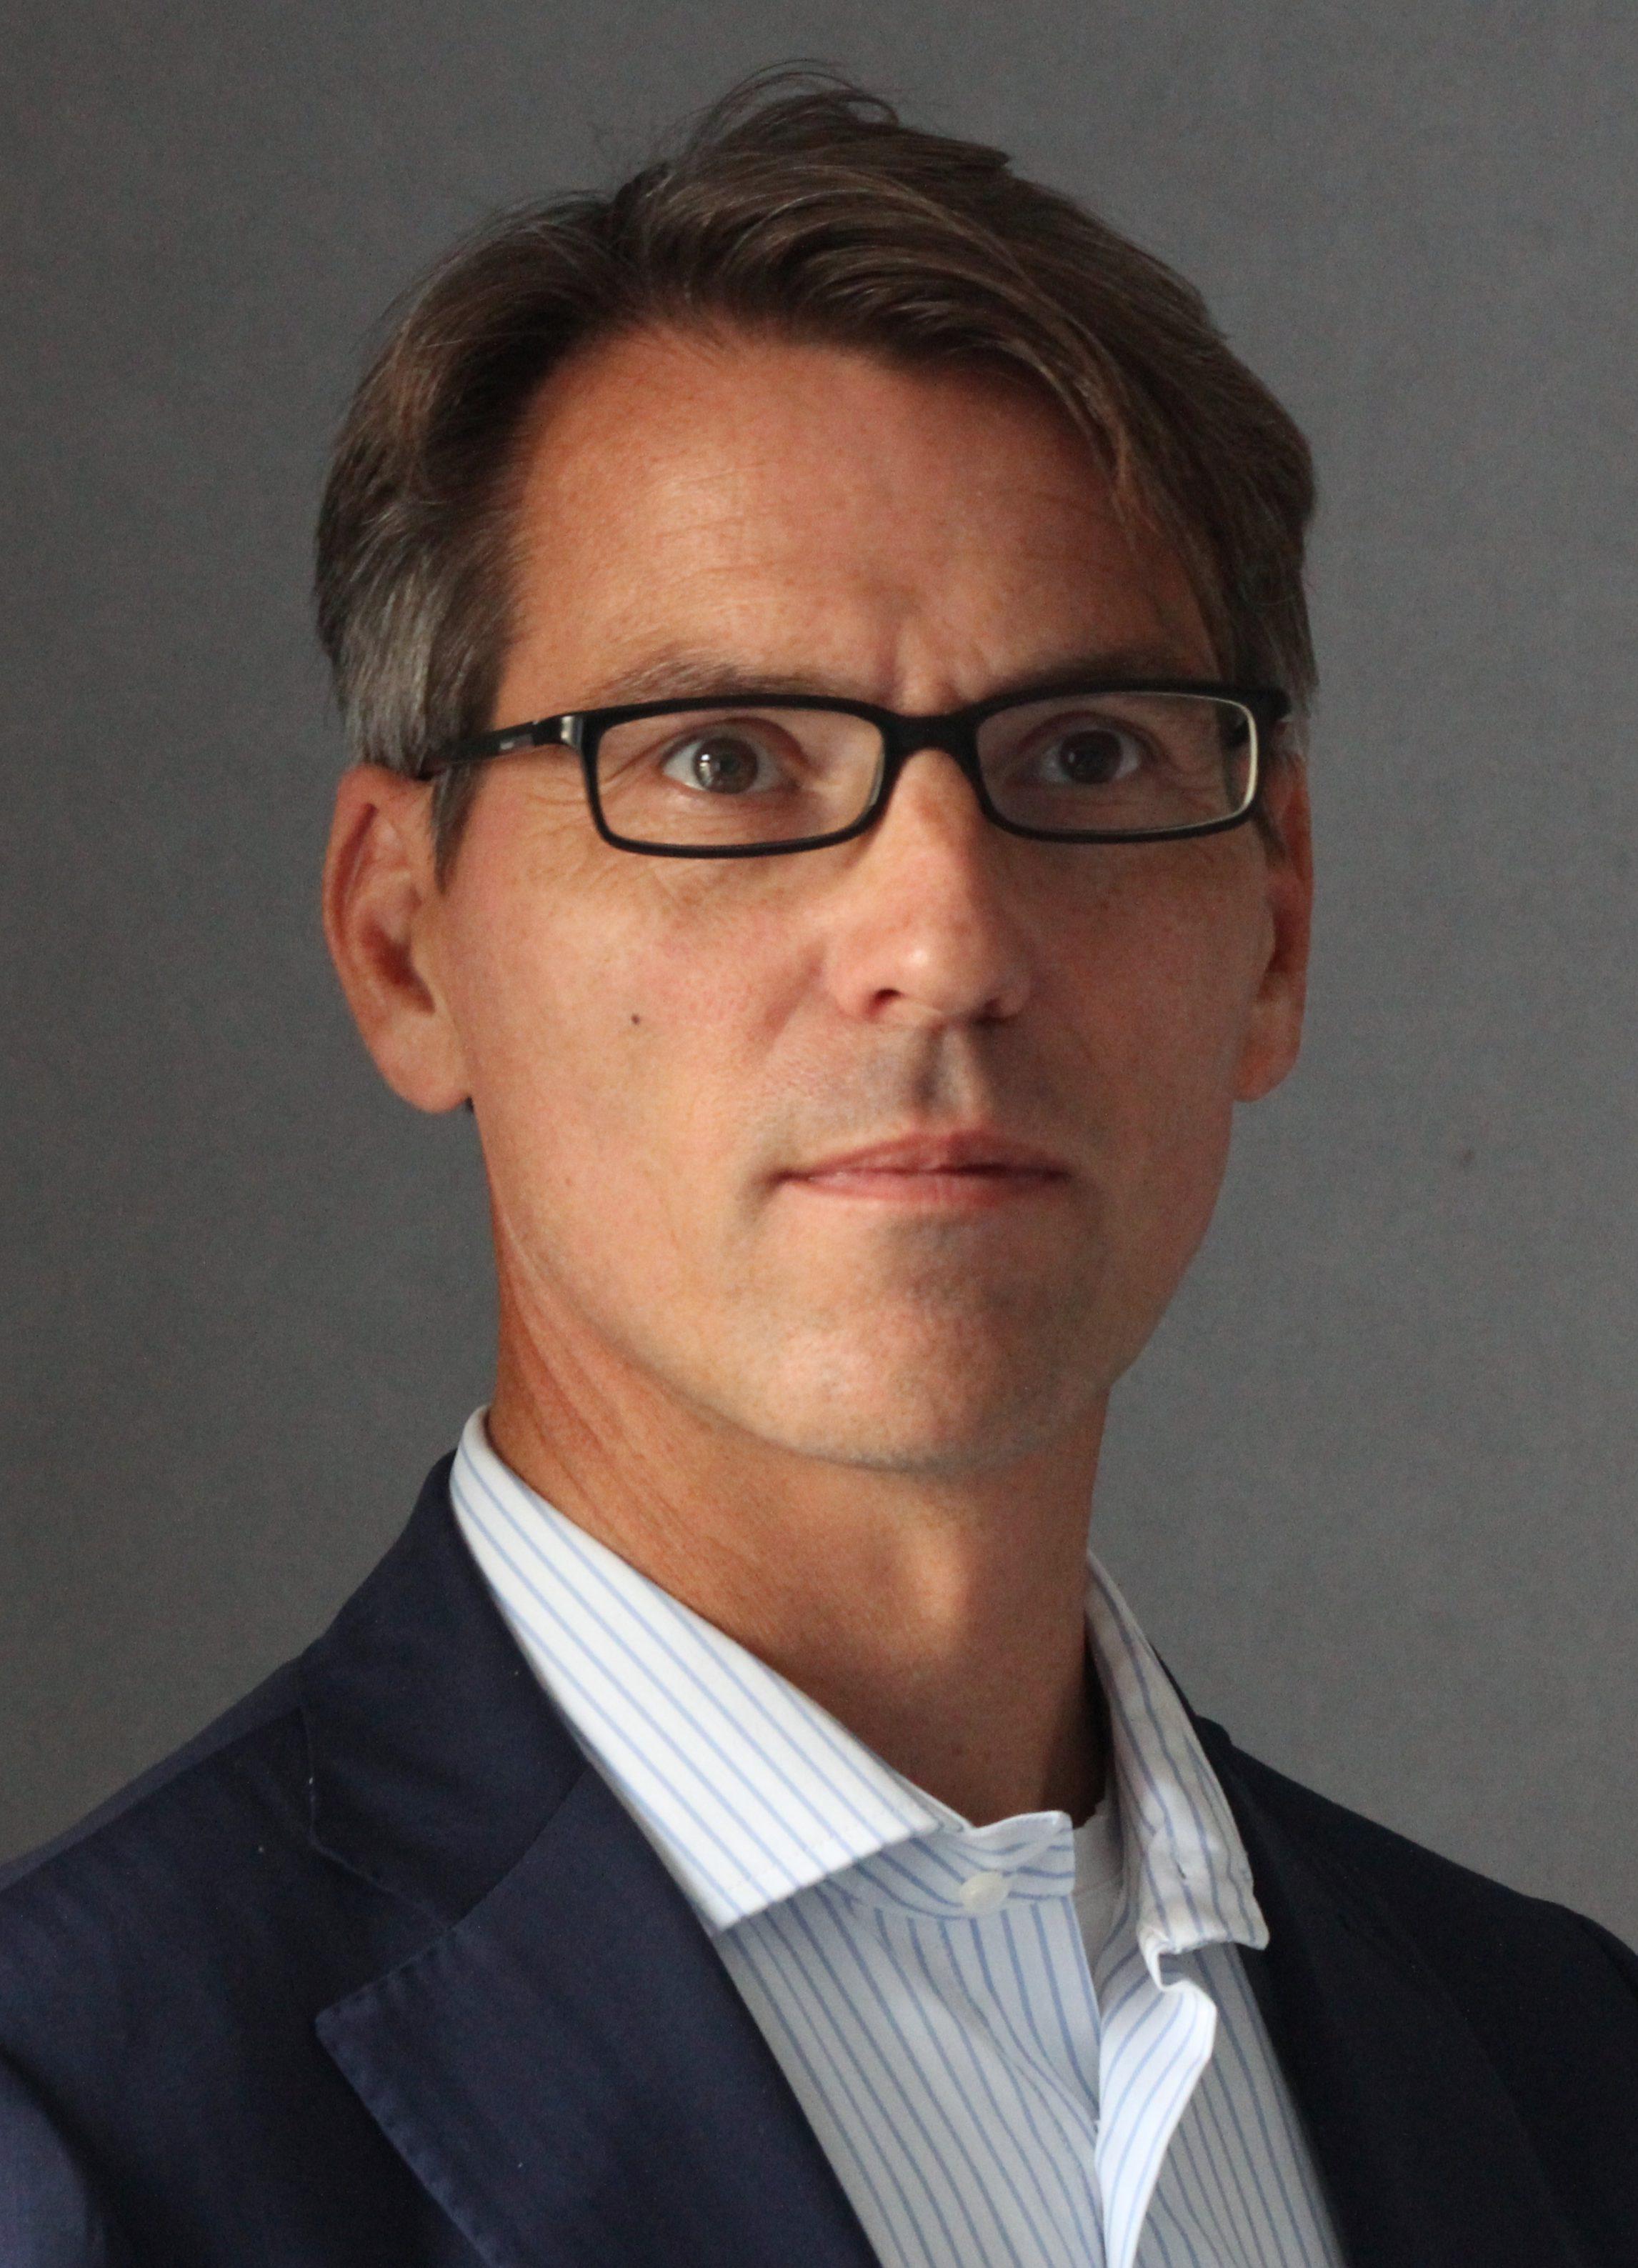 Bart Wijnands